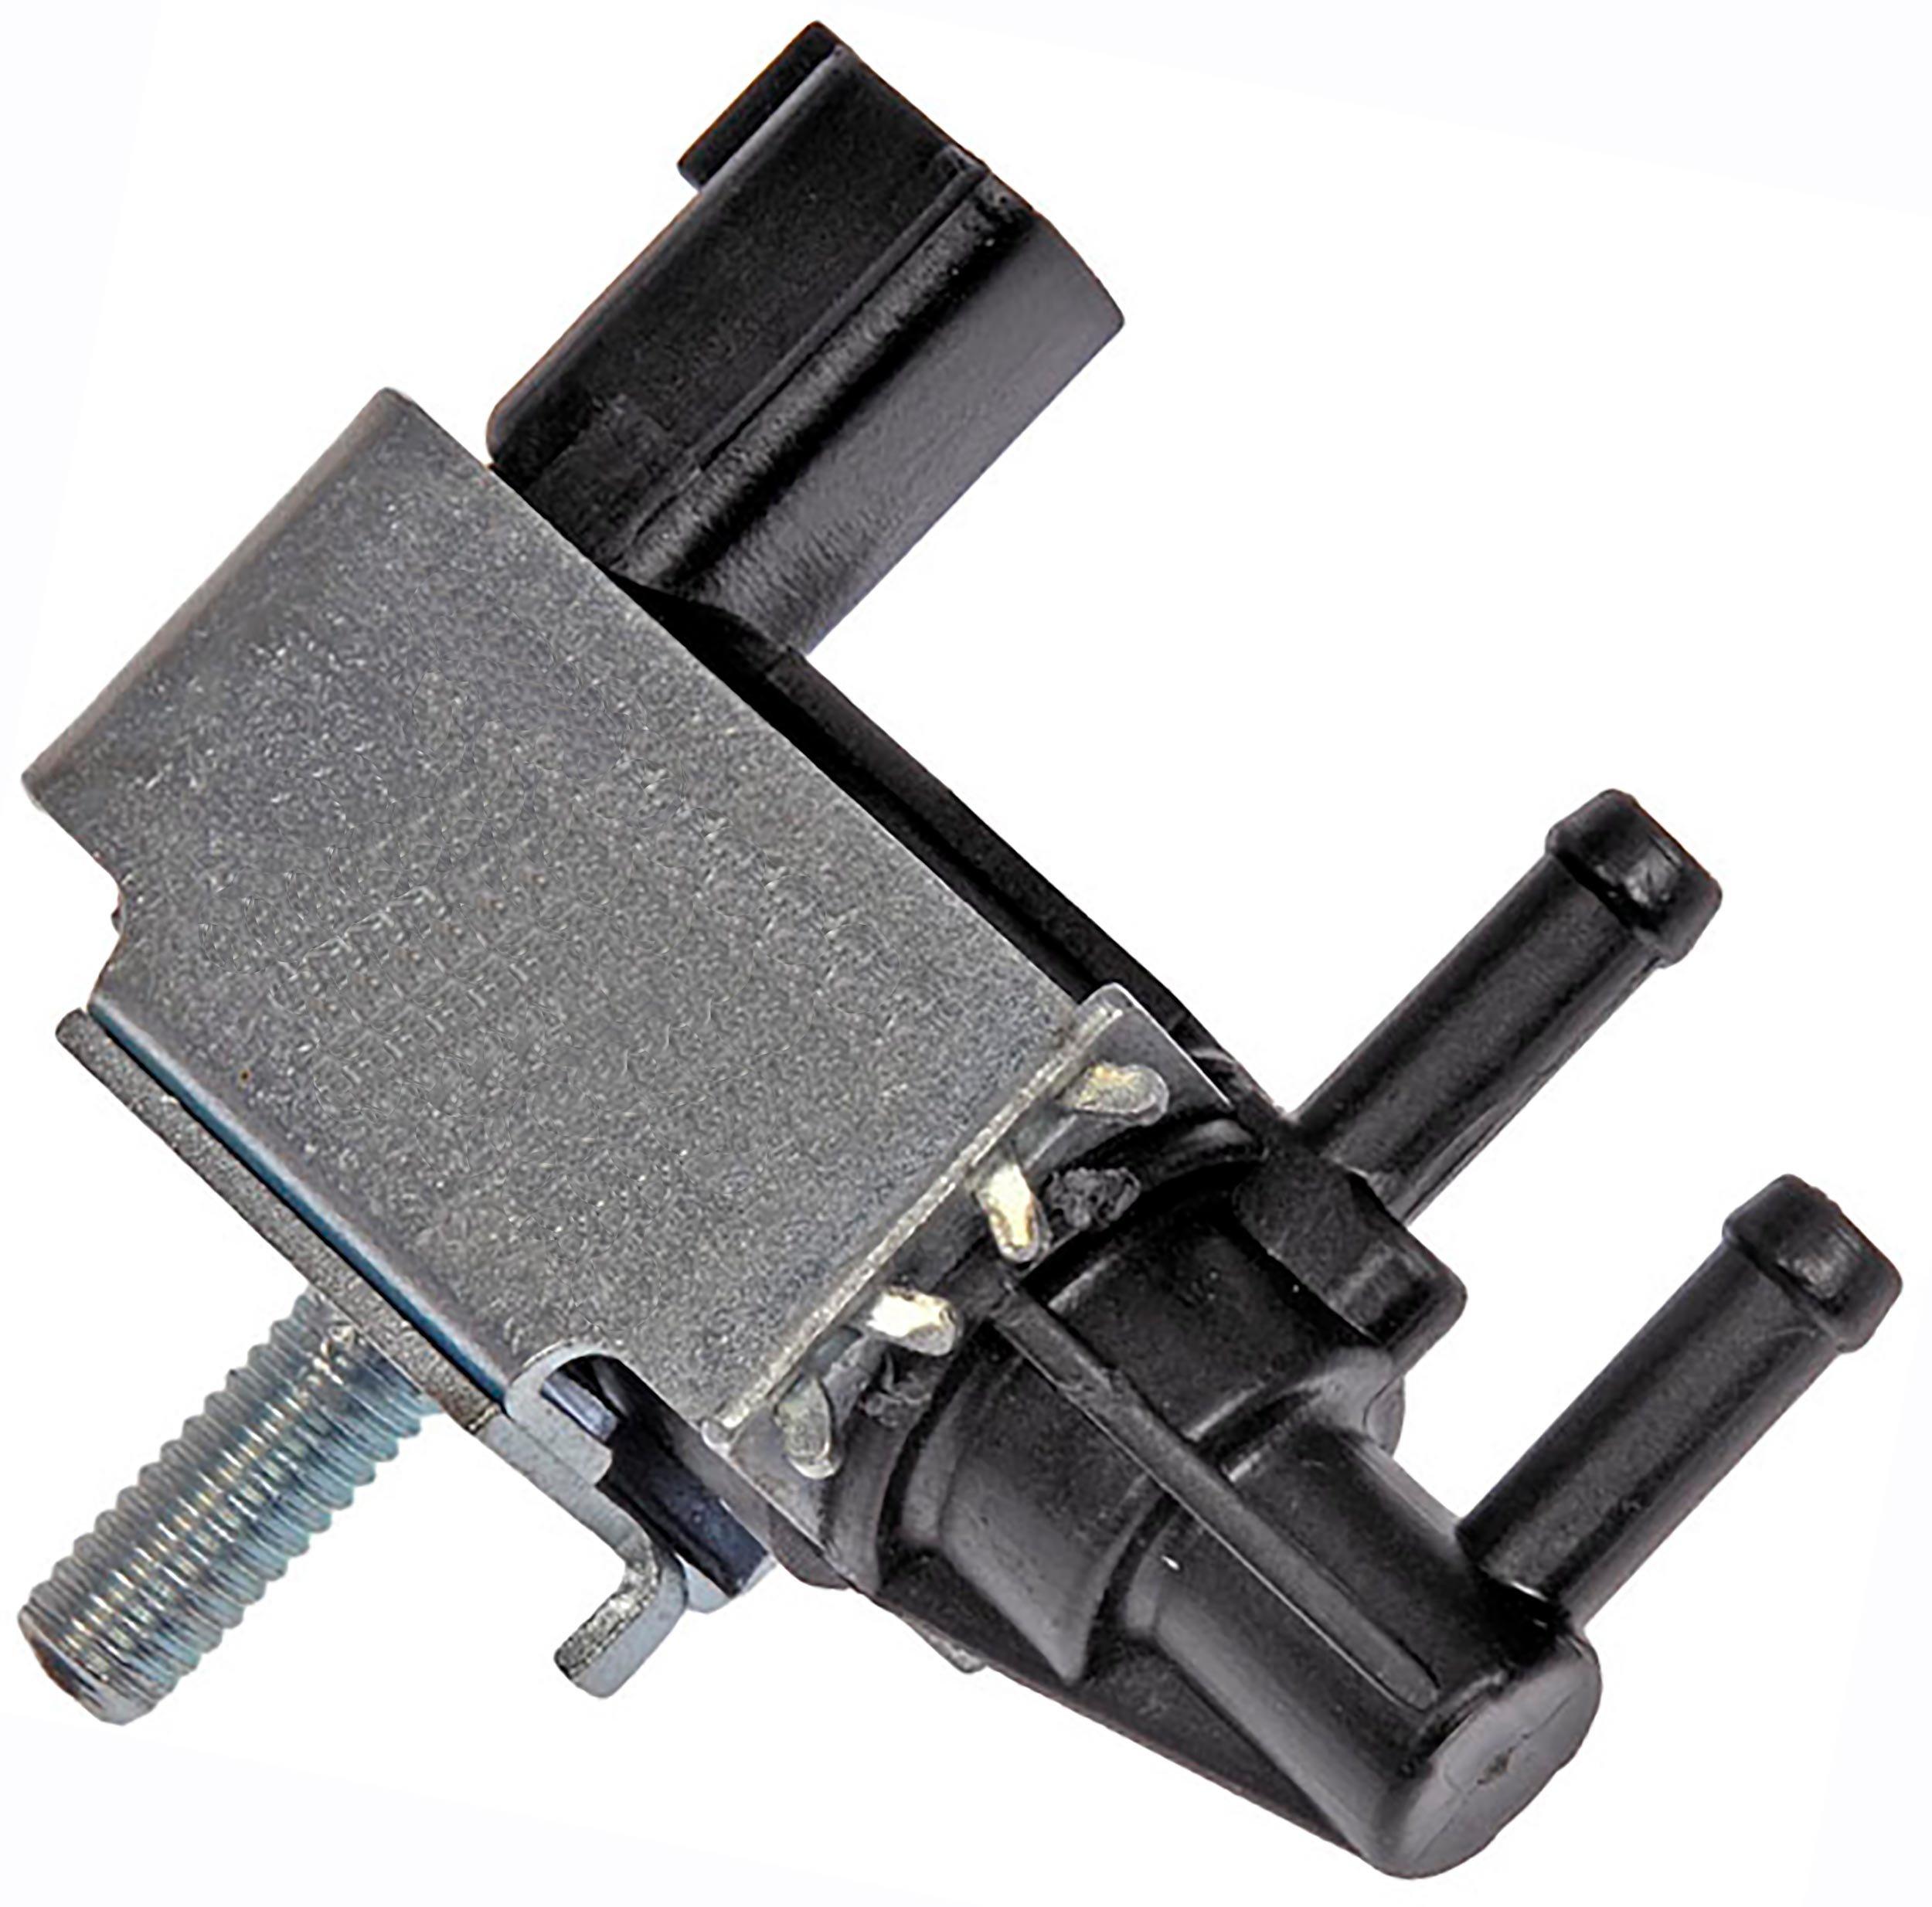 APDTY 138715 Vapor Canister Purge Valve Fits Select 1998-2008 Infiniti / Nissan (Check Compatibility Chart; Replaces 14308U300, 149308U30A, 149309E010, 149309E011, 149309E01A)